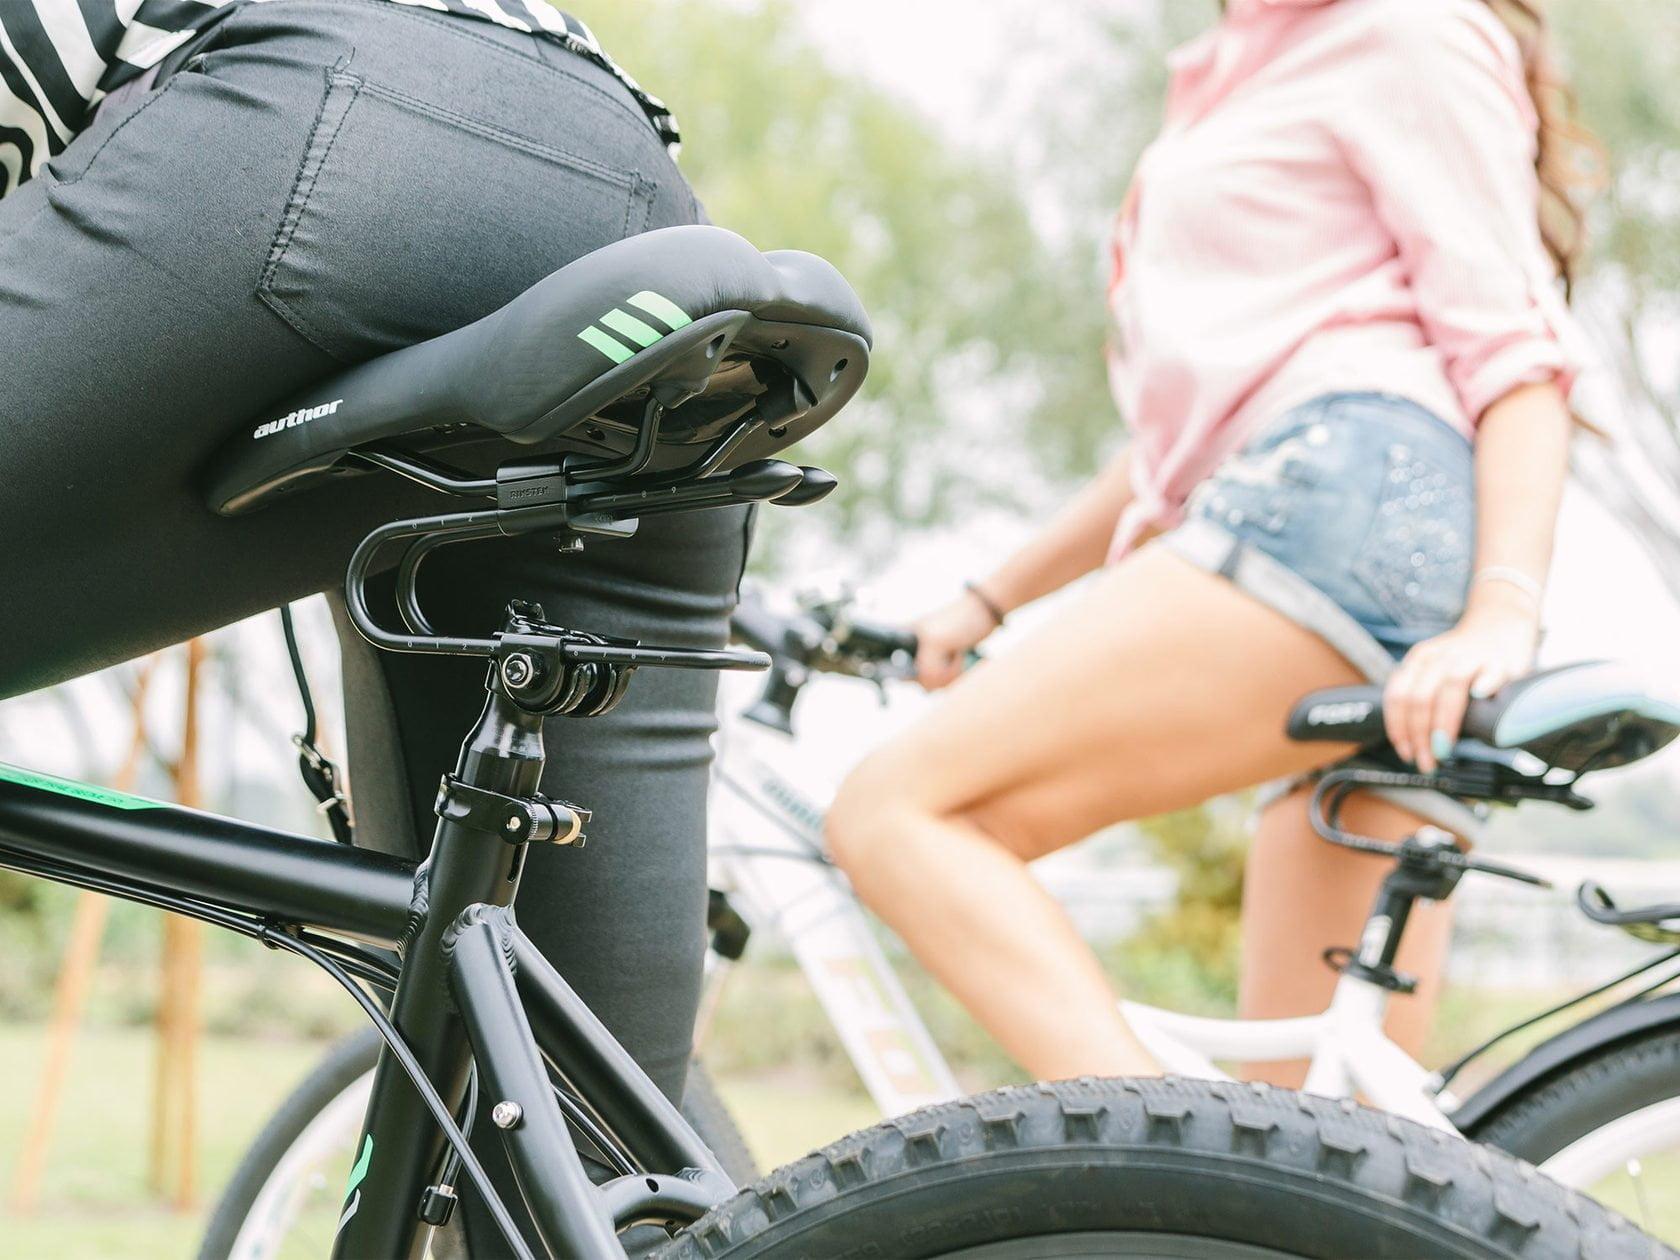 Rinsten Spring – Universal Underseat Bicycle Shock Absorber